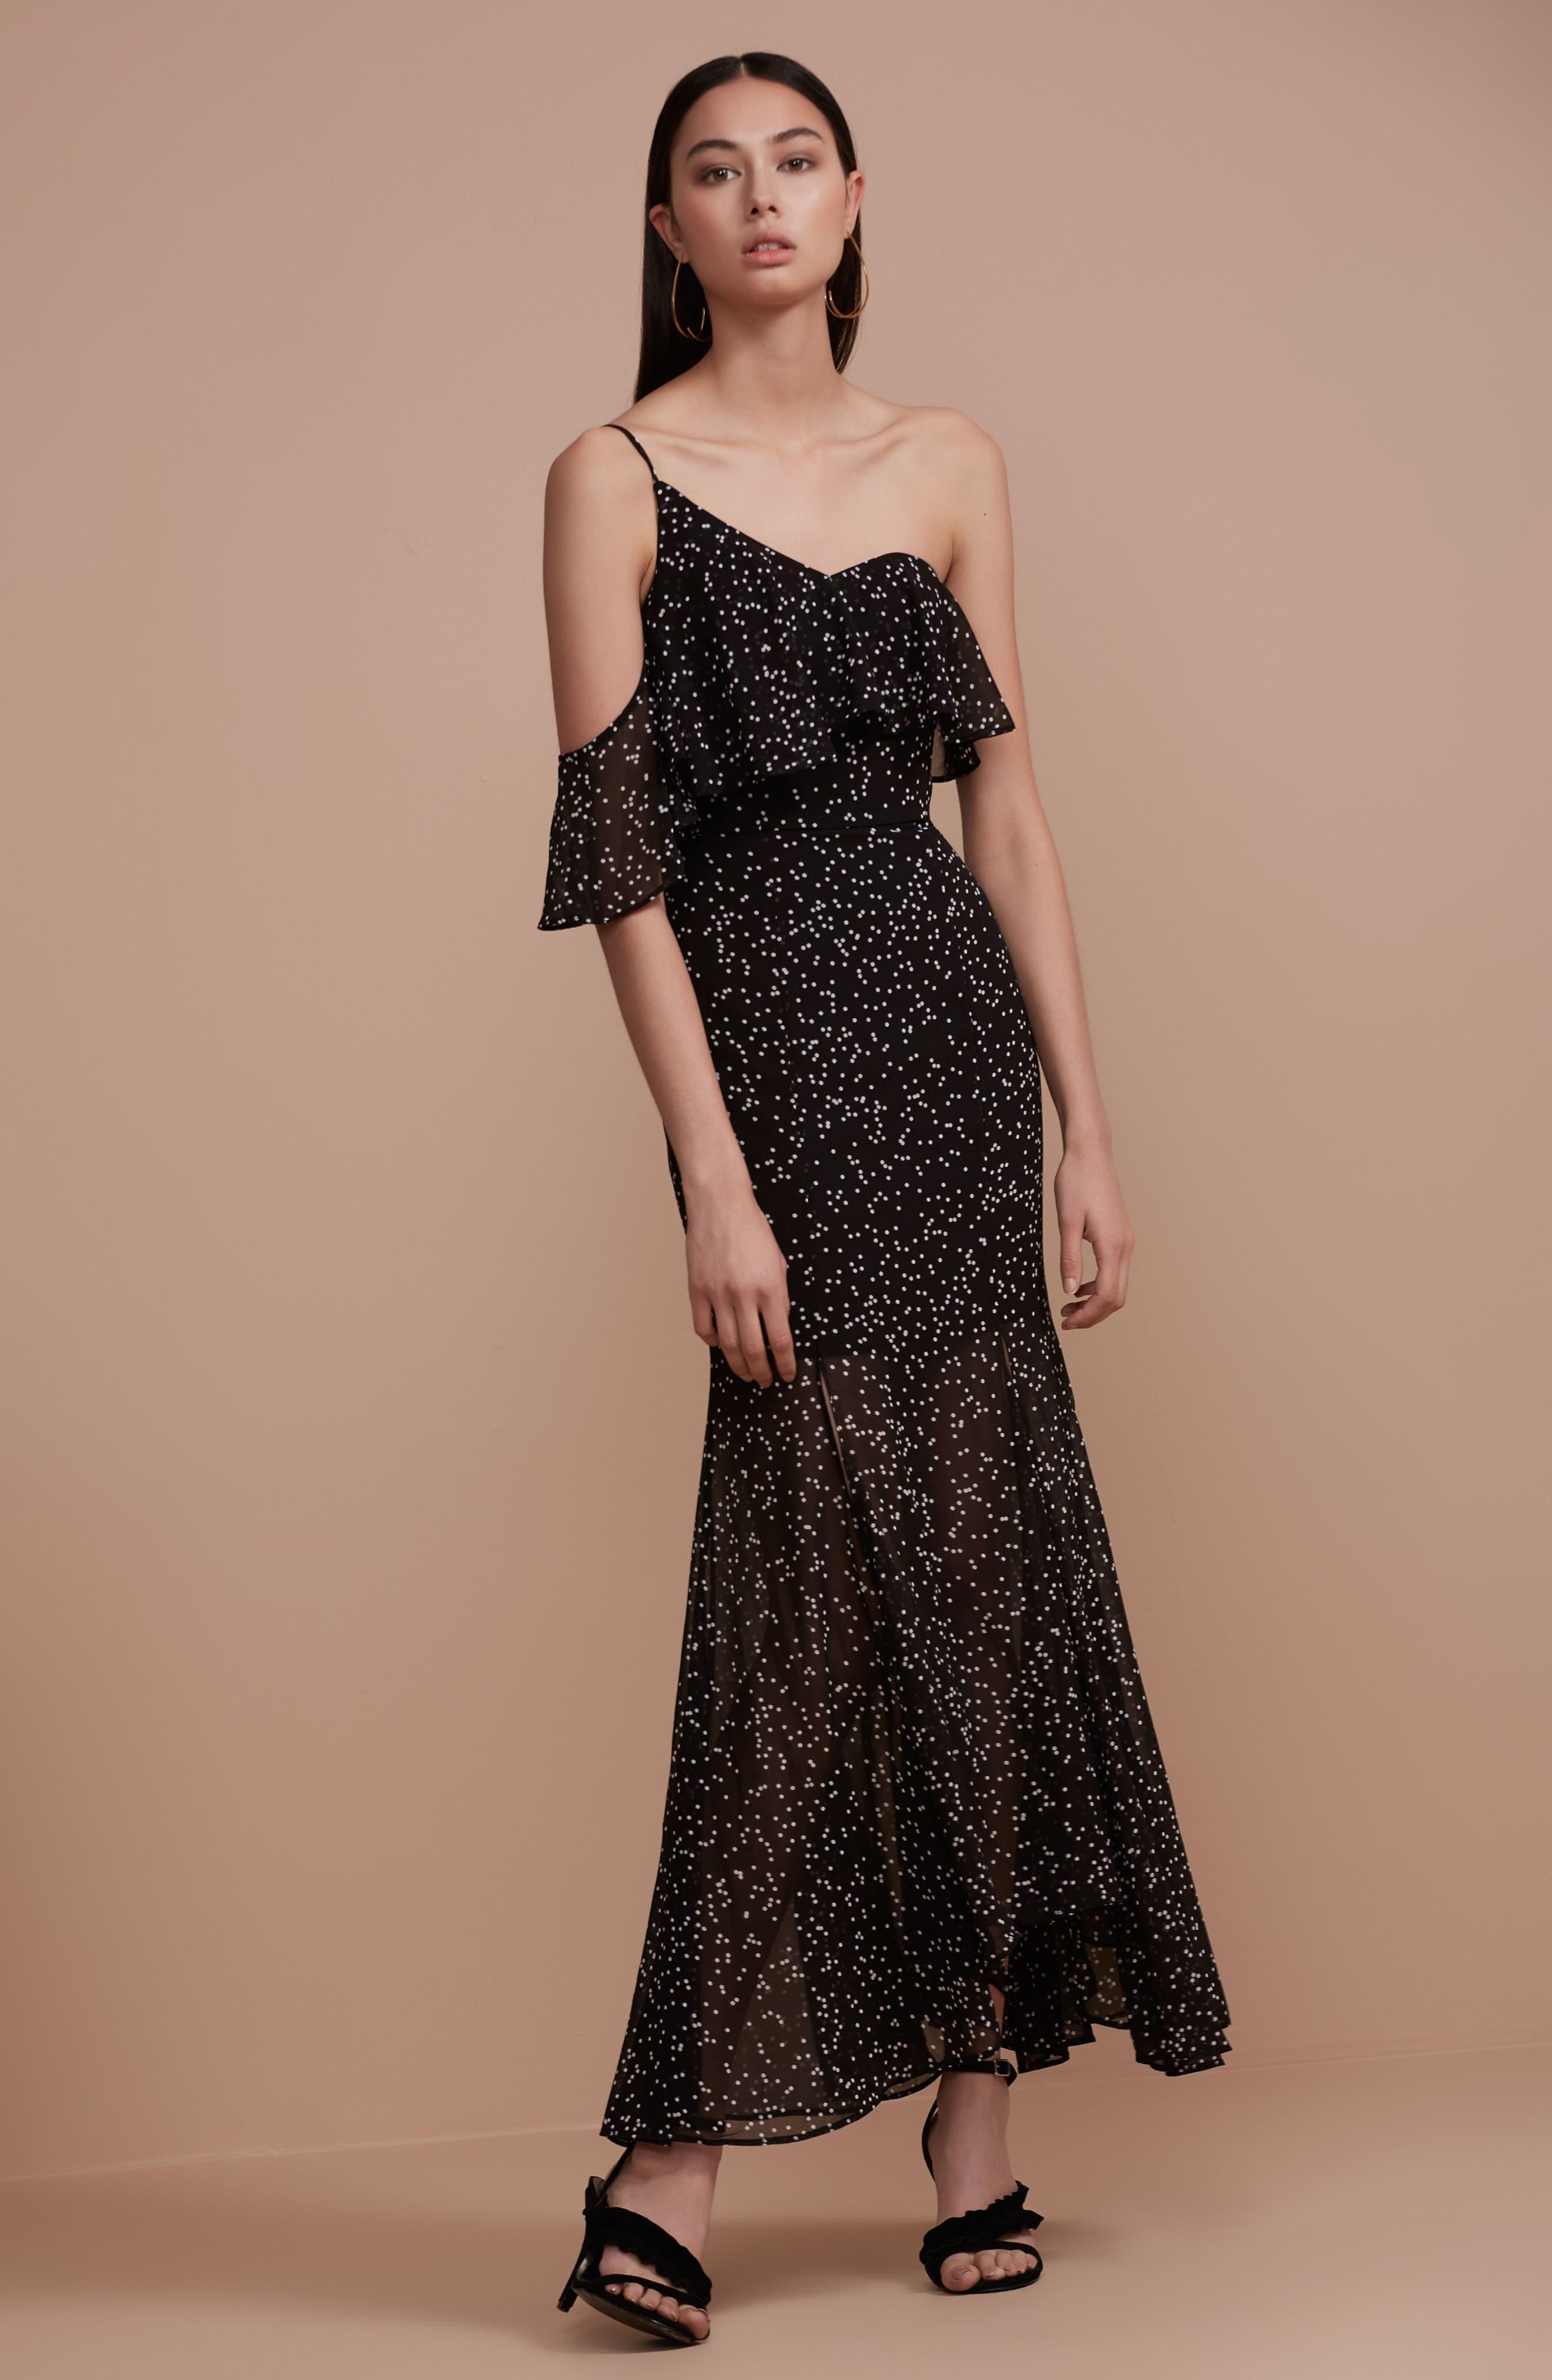 Embrace One Shoulder Dress,                             Alternate thumbnail 2, color,                             Black W White Spot